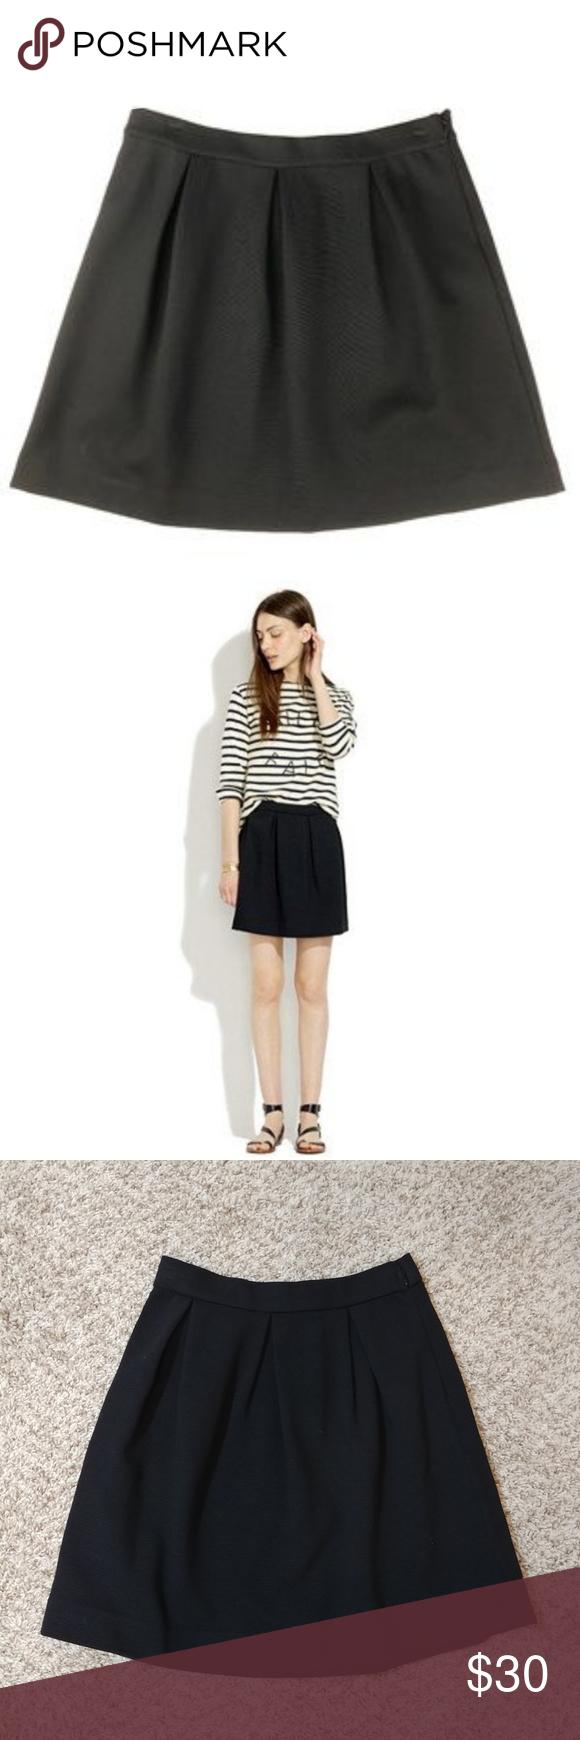 c76714b99c Madewell Bistro Mini Skirt Size 0 Black #49752 68% viscose, 28% polyamide,  4% spandex Medium weight knit with great stretch Flattering box pleats  Hidden ...